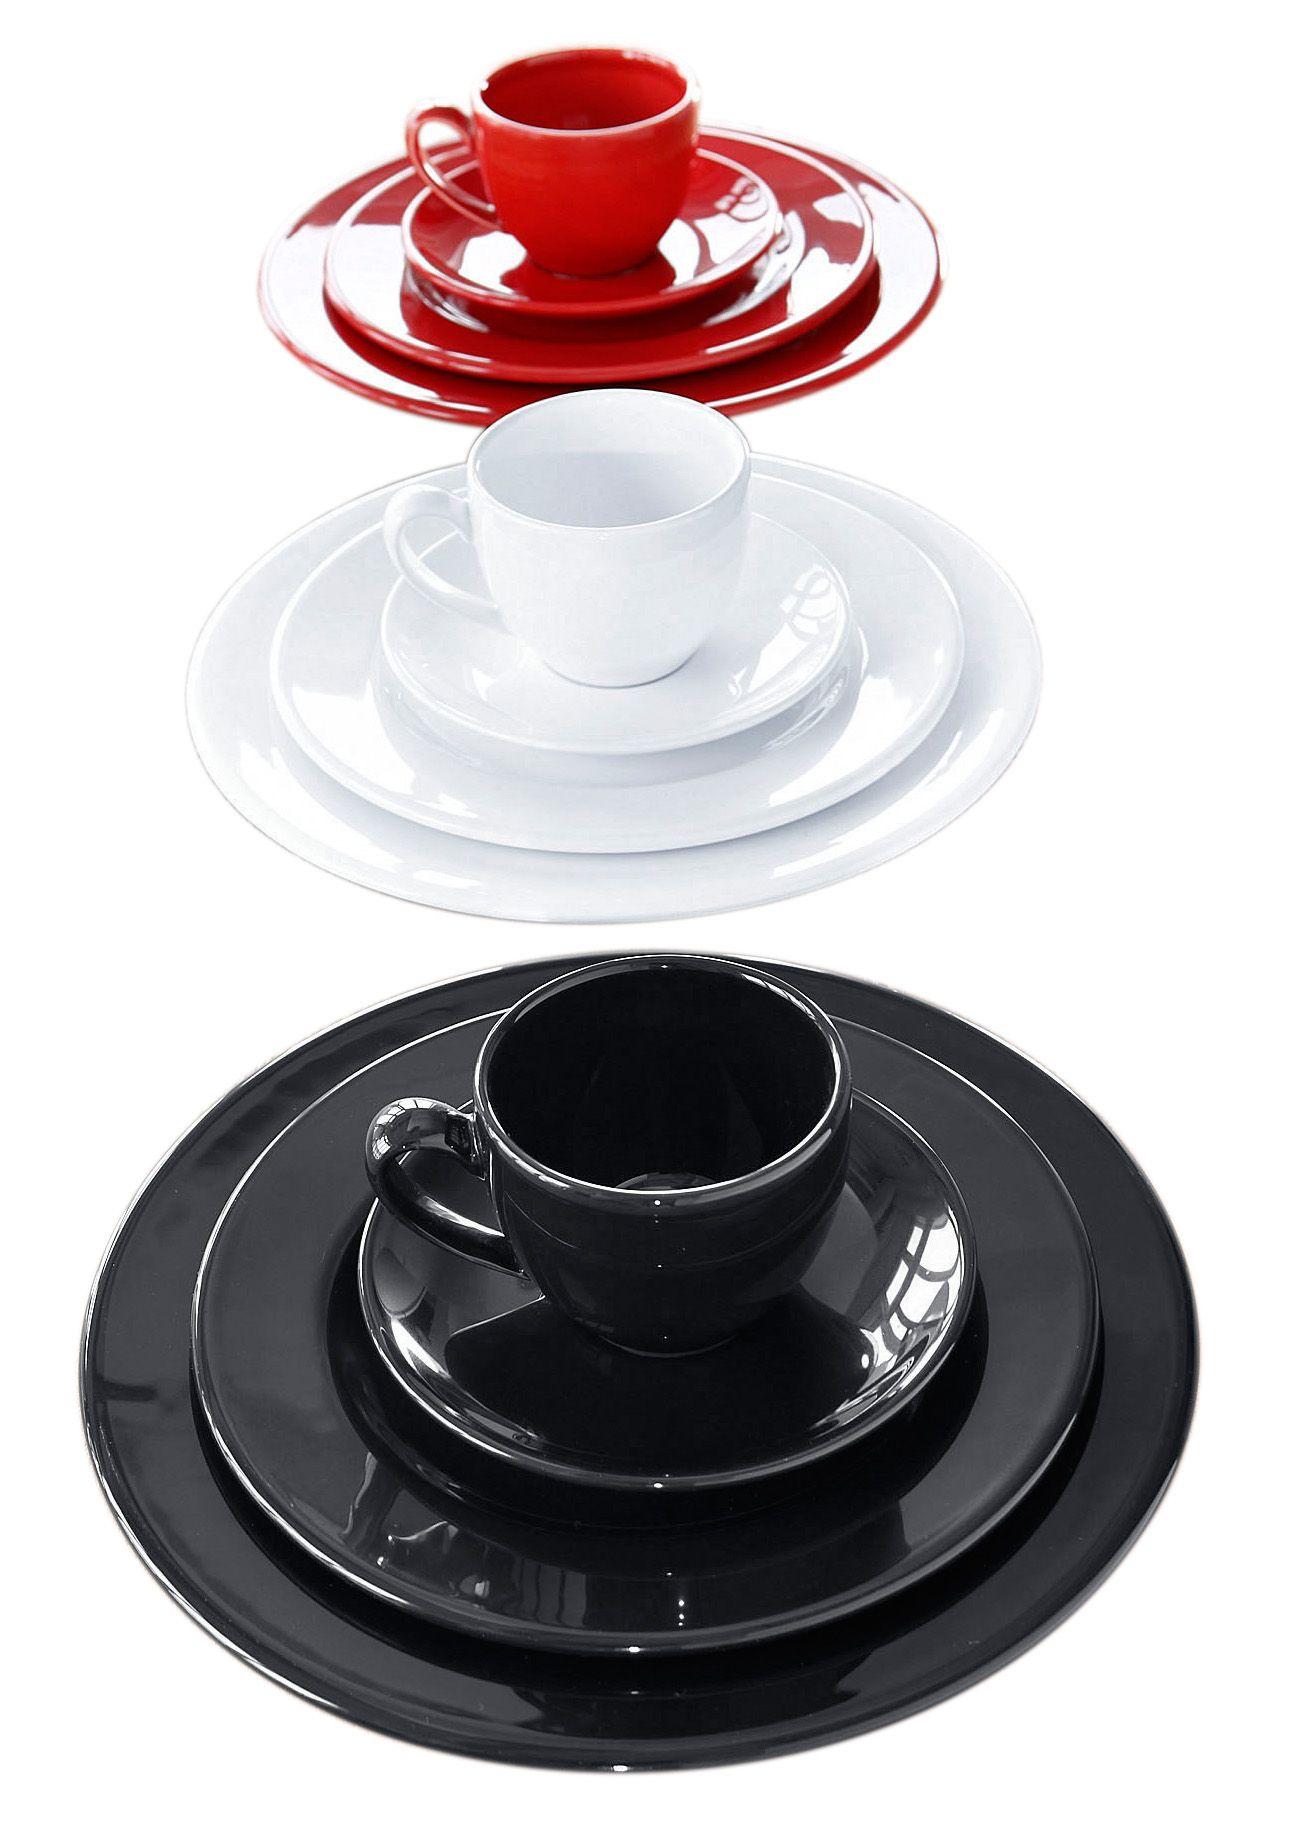 CREATABLE CreaTable Kaffeeservice, Steingut, »CASA ALEGRE« (18-teilig)